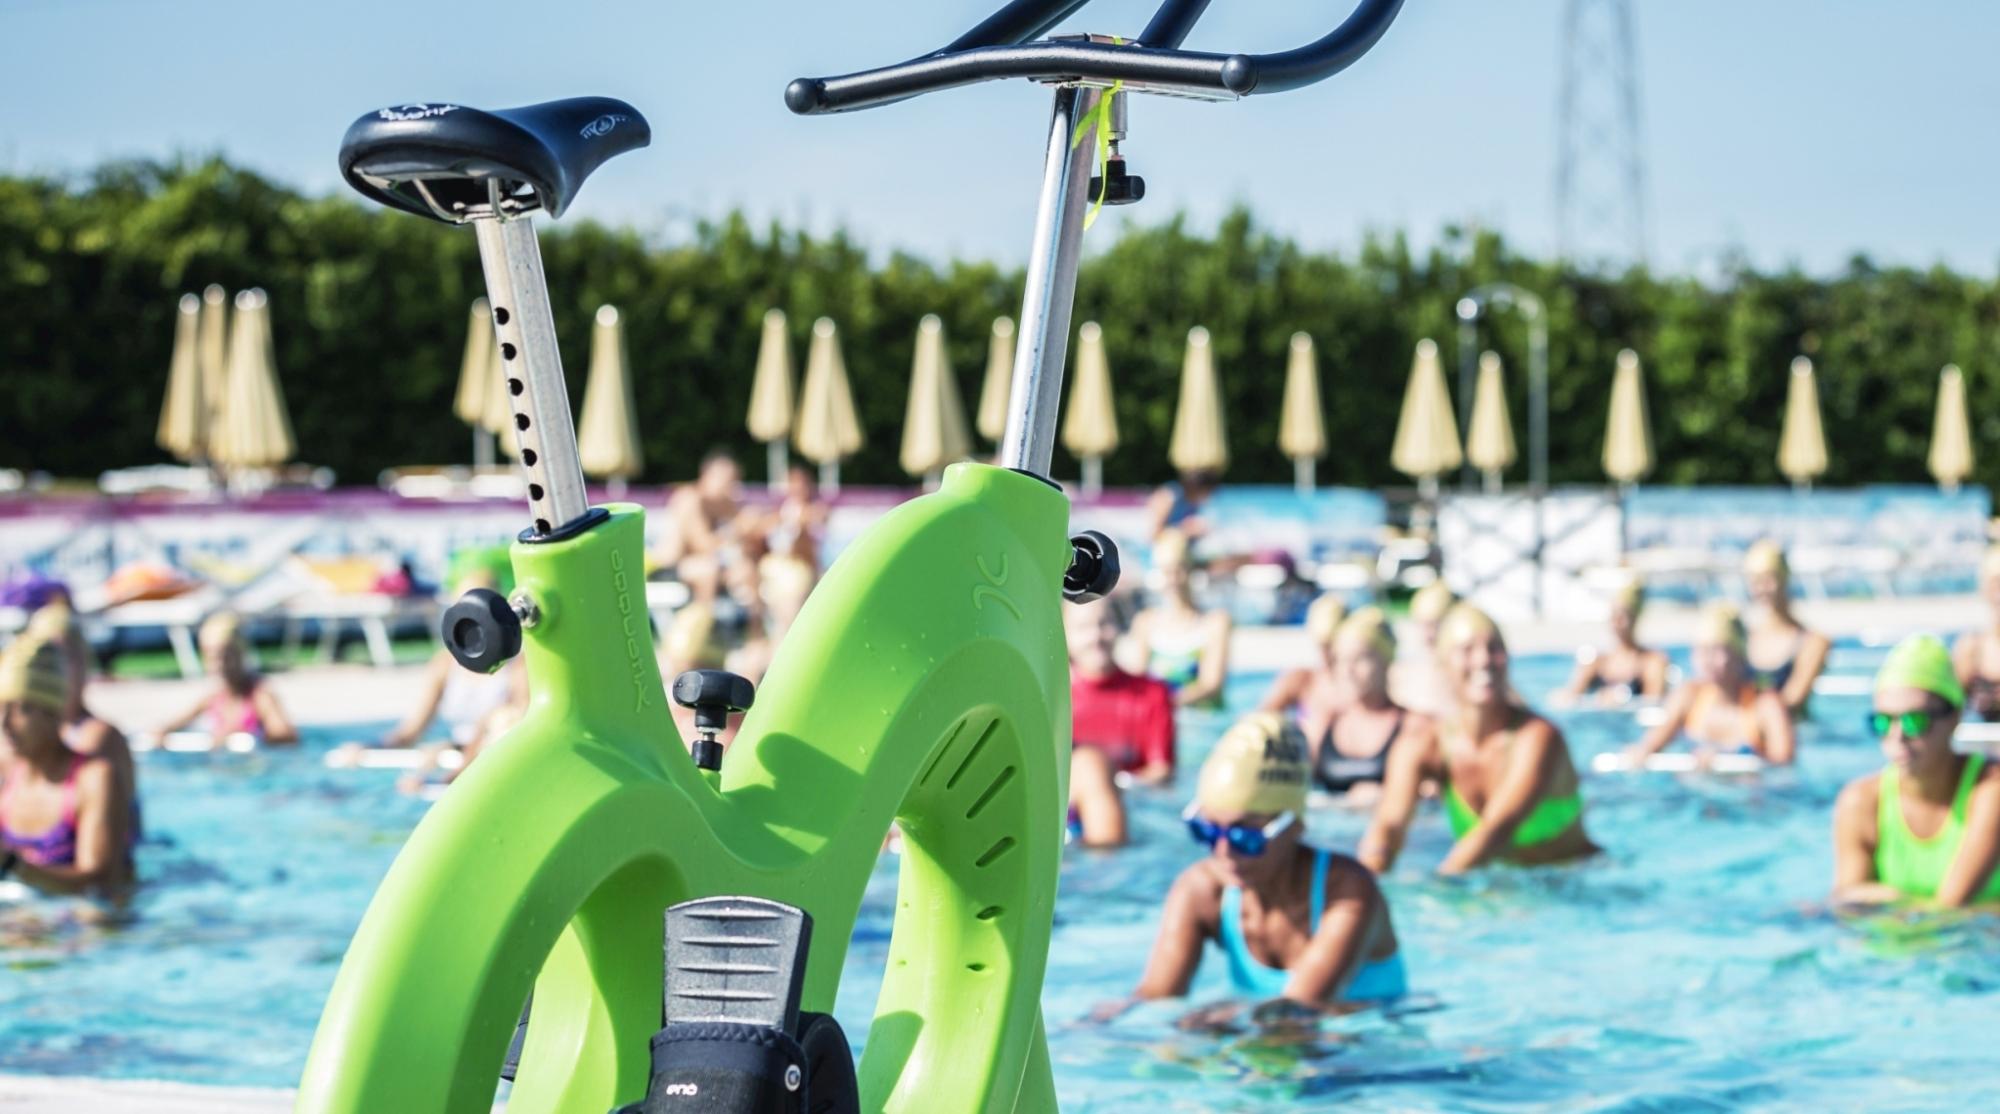 Aqquatix pool equipment production